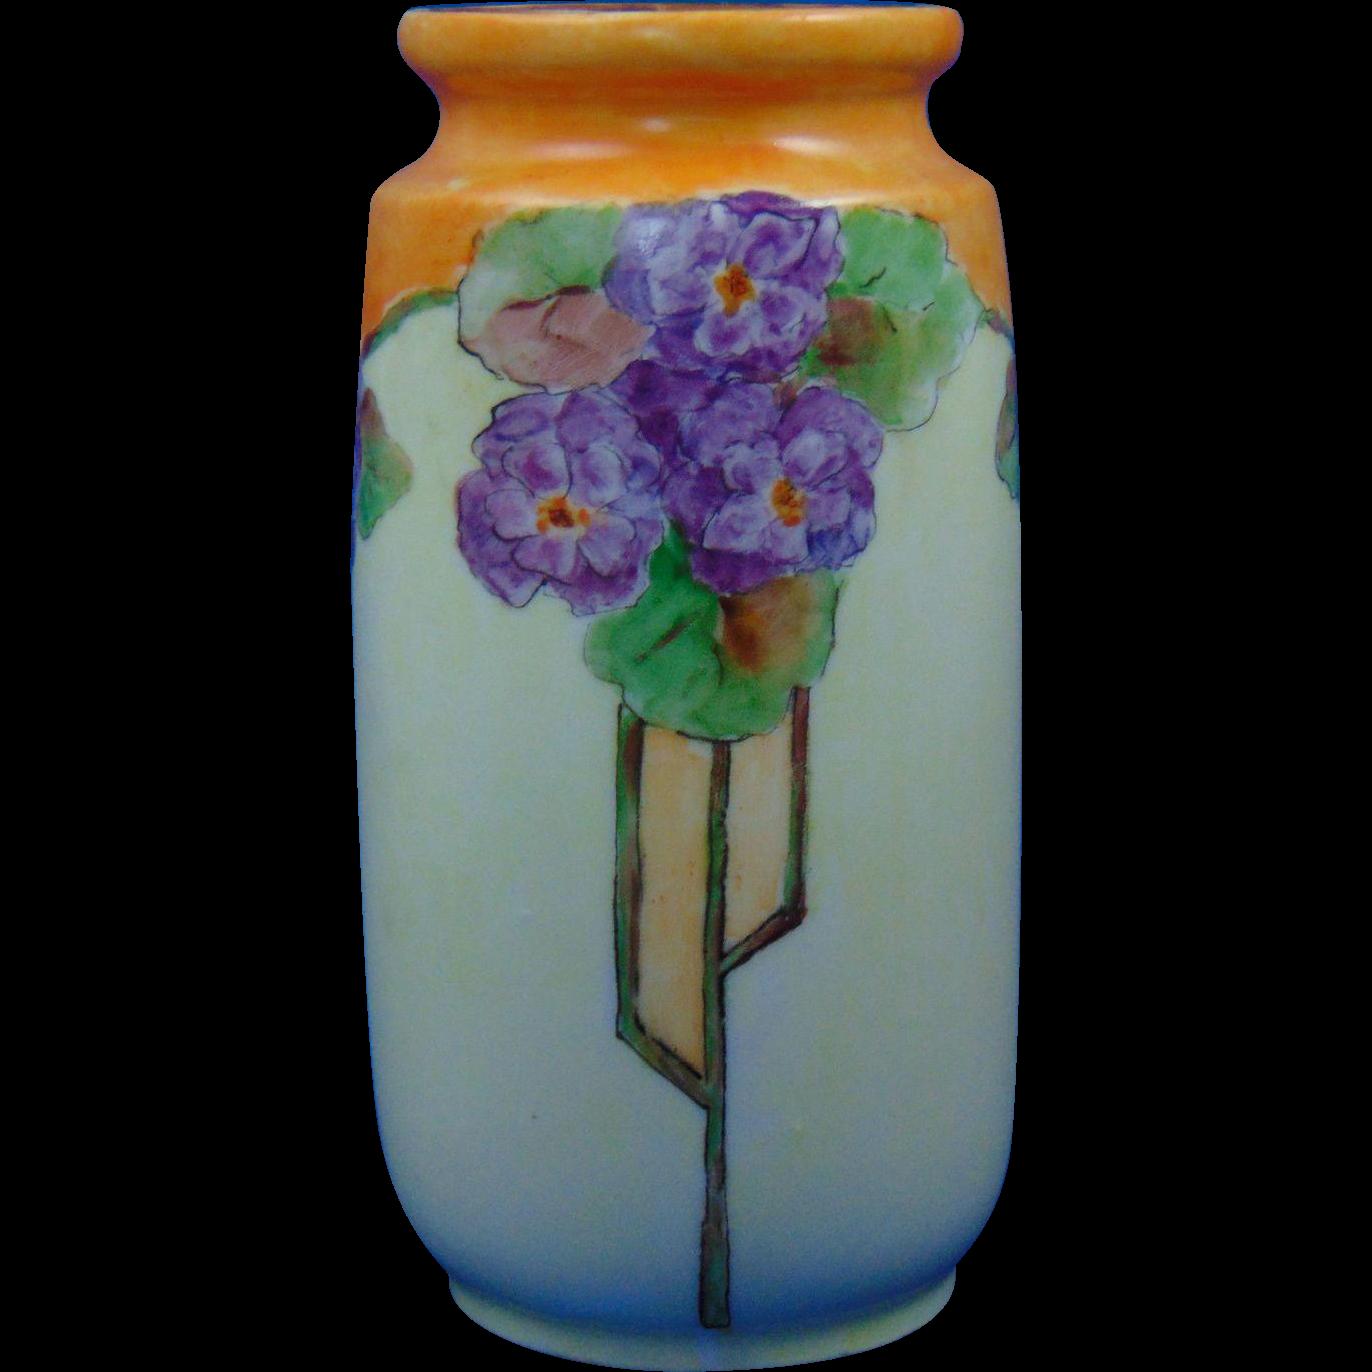 Wehinger Czecho-Slovakia Arts & Crafts Violet Design Vase (c.1918-1936)